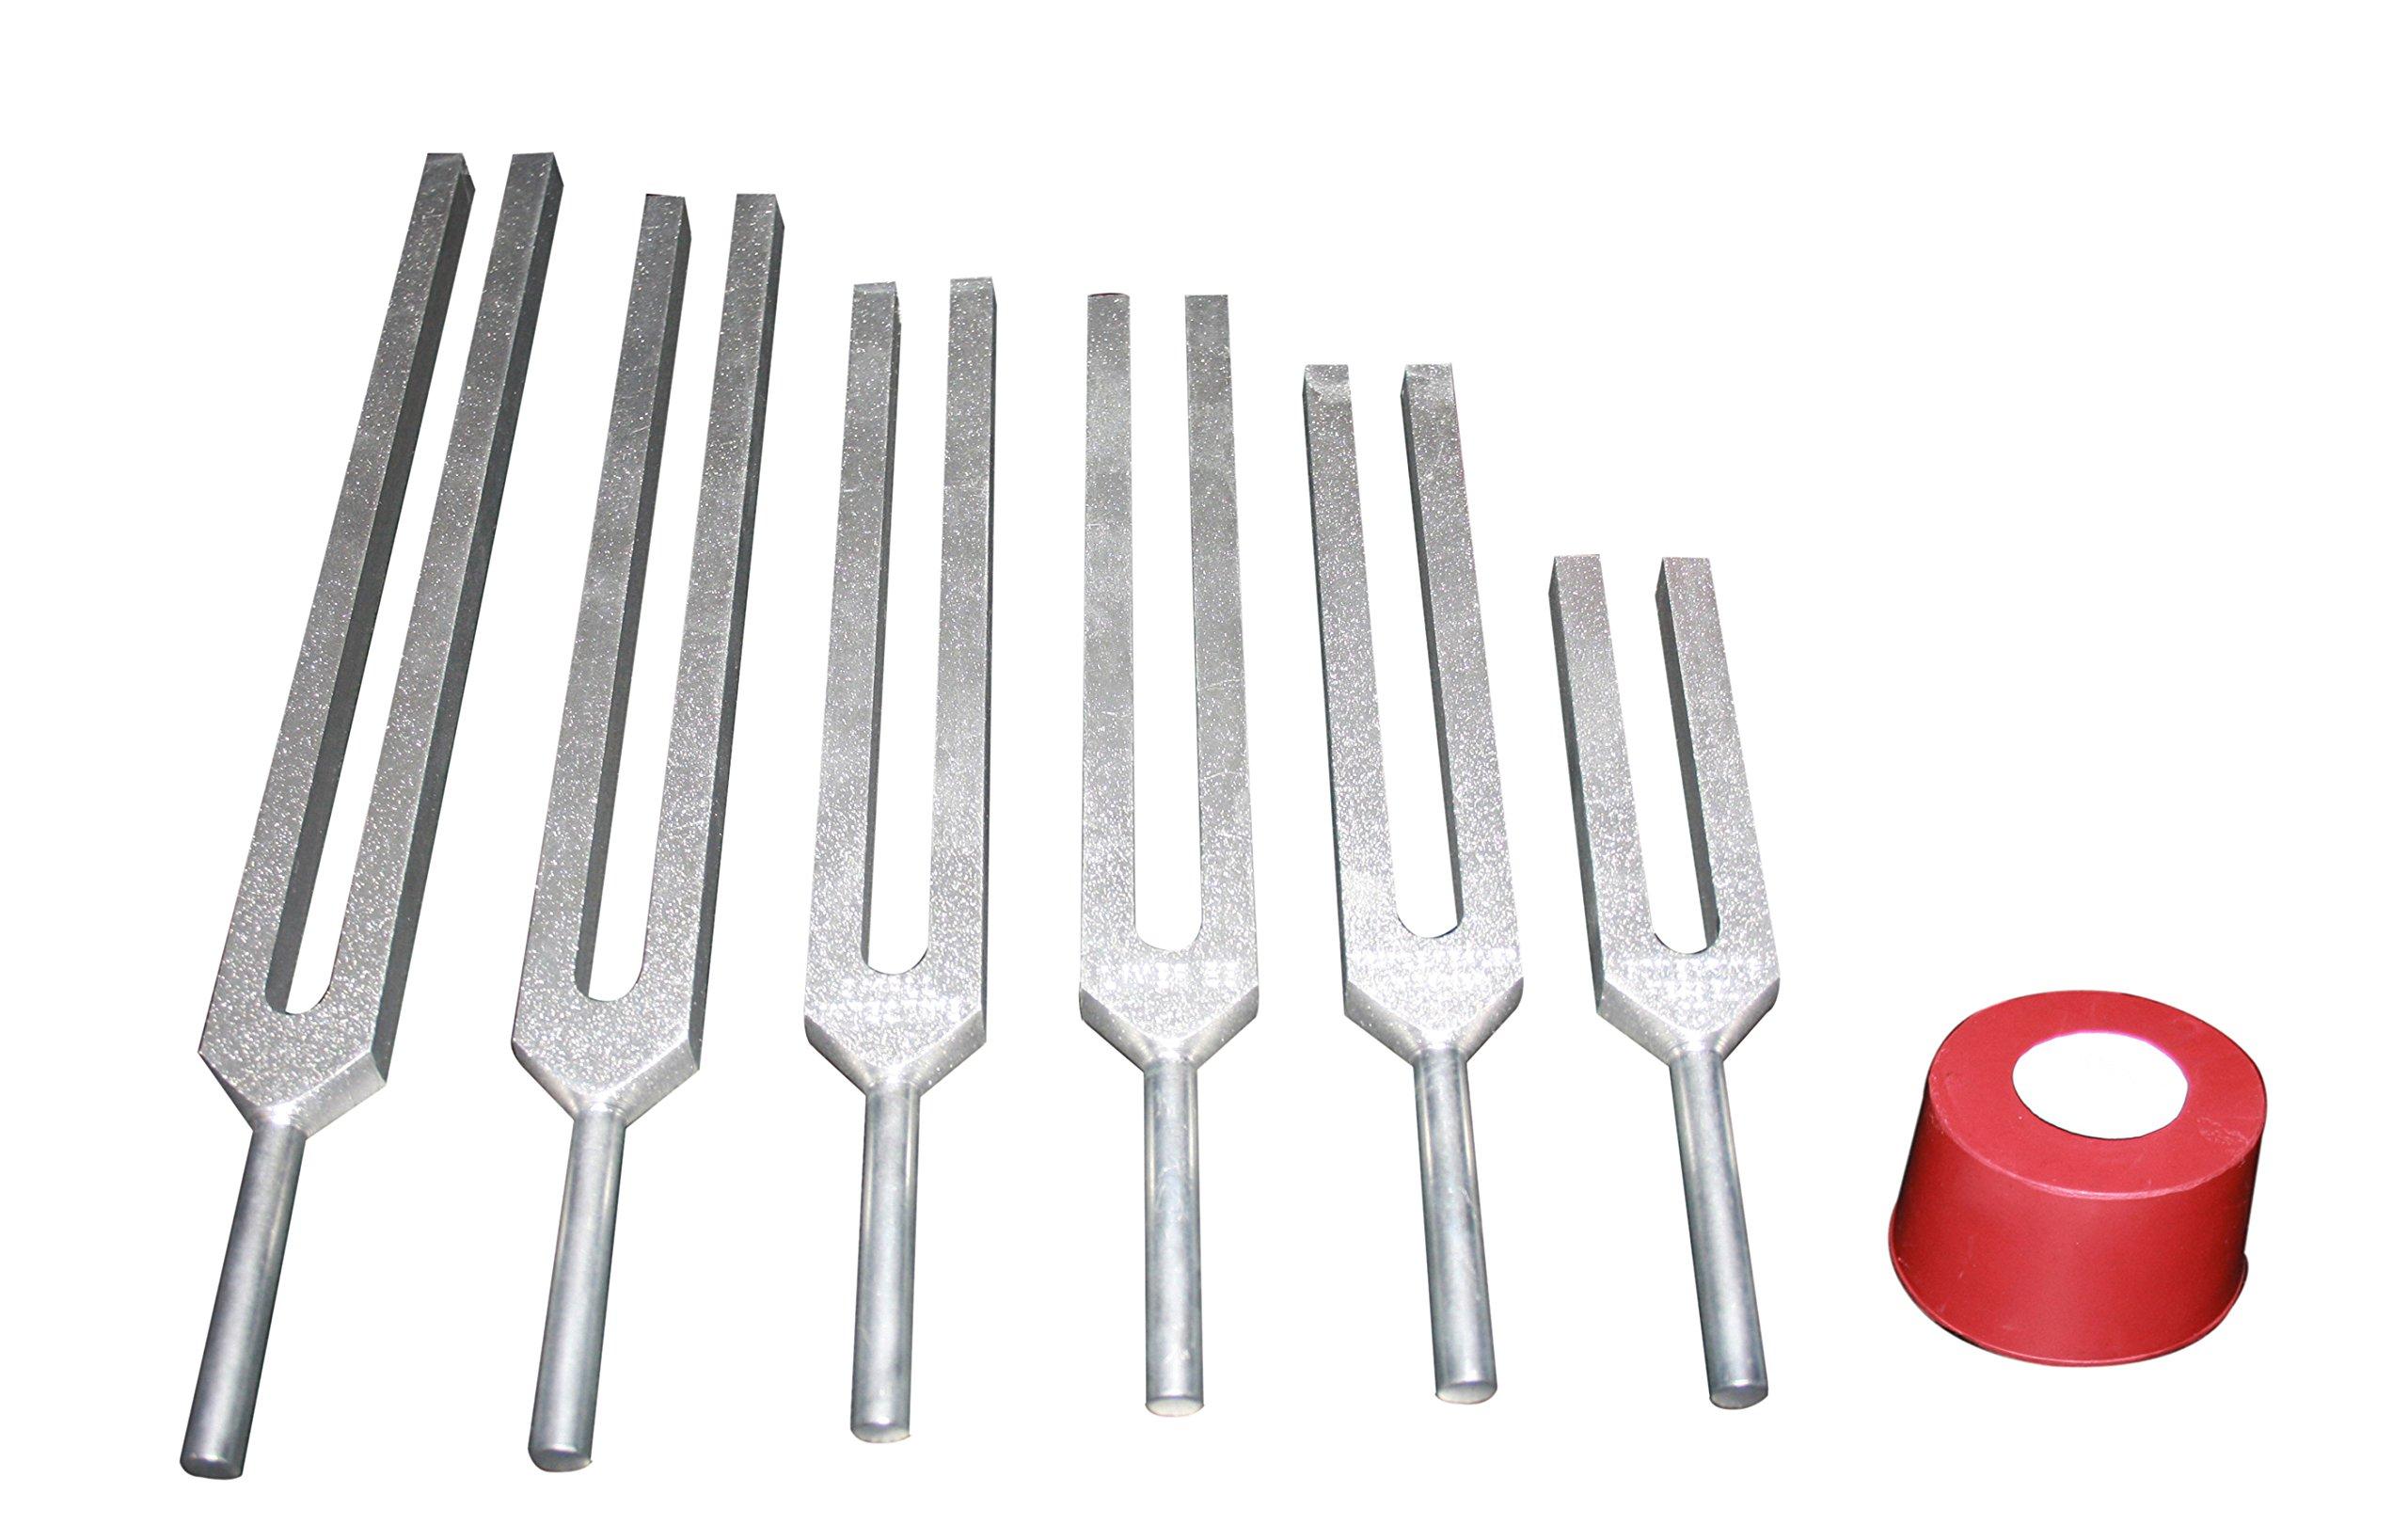 Radical Sacred Solfeggio 6pc Tuning Forks - DNA Repair - Blessings Miracles Awakening Liberation